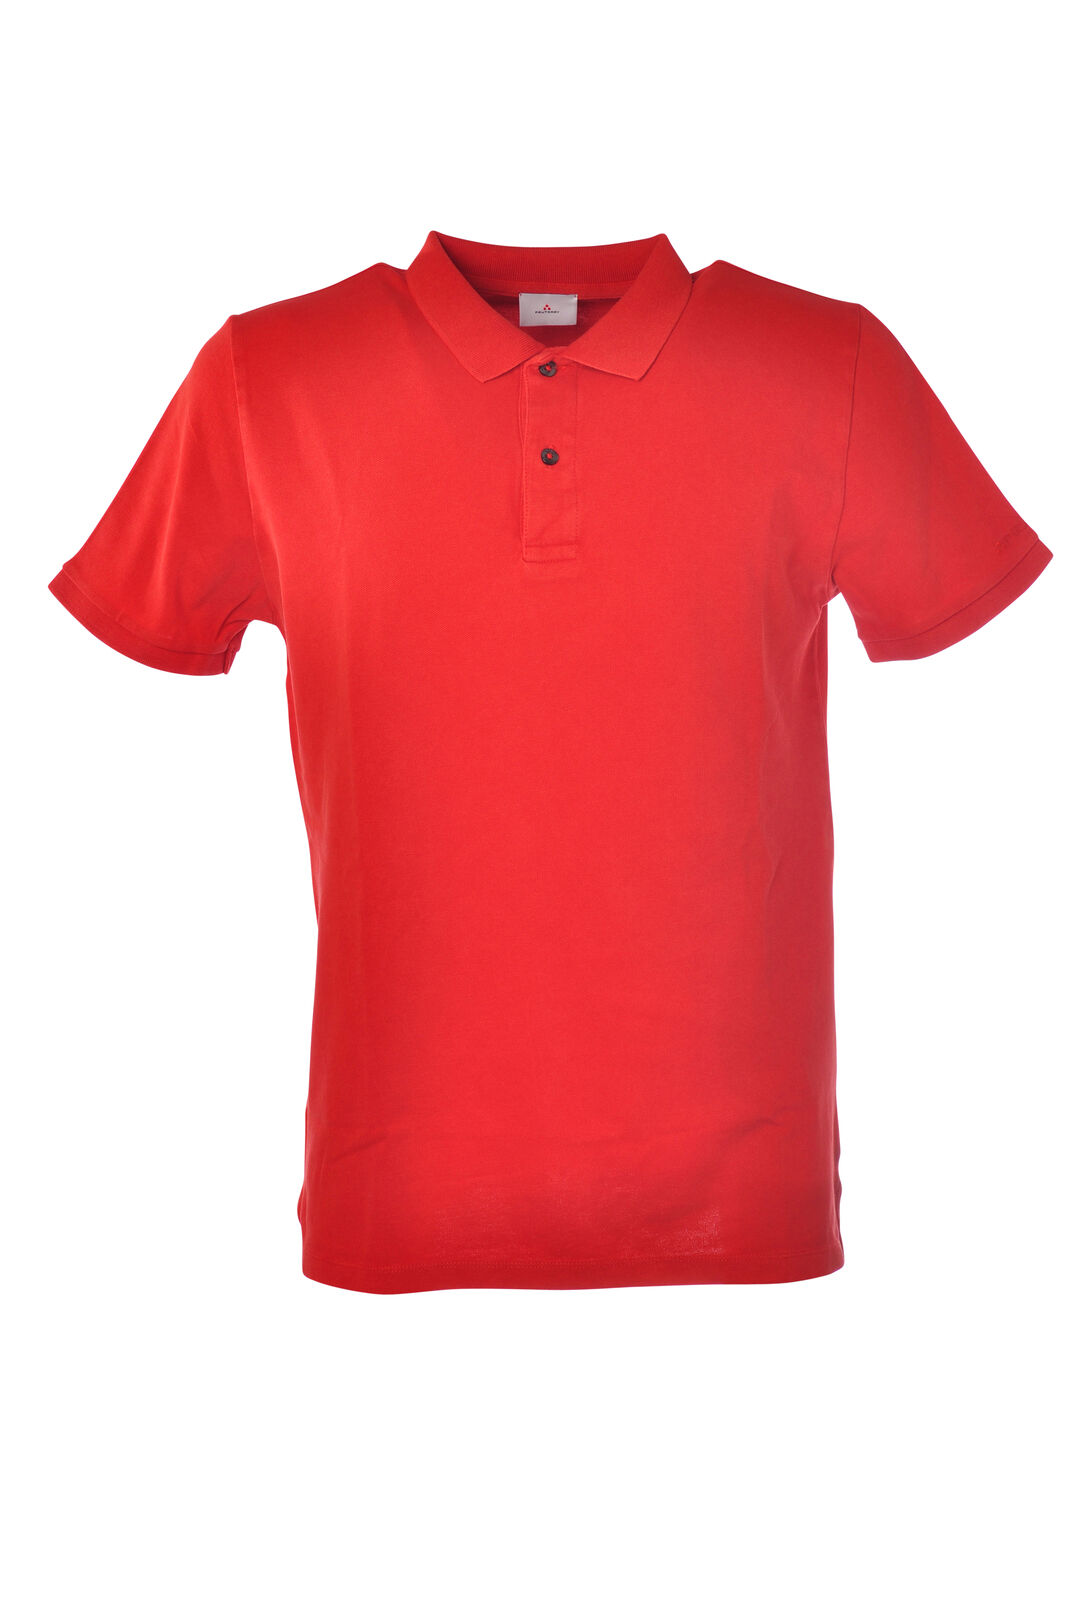 Peuterey - Topwear-Polo - Man - rot - 5322308F185125